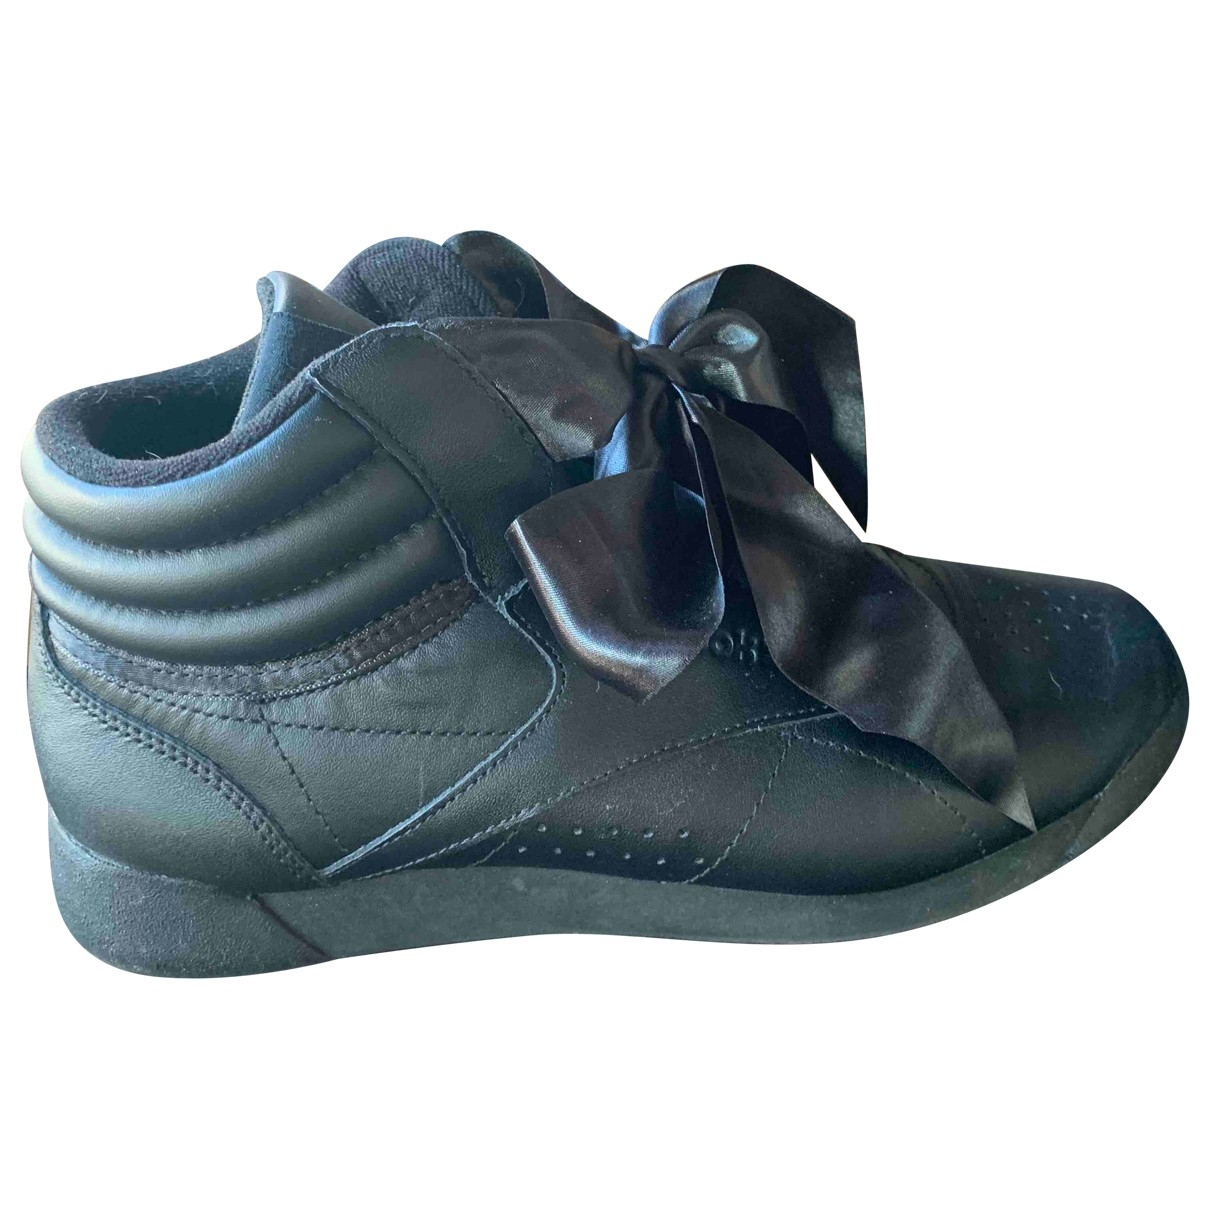 Reebok \N Black Leather Sandals for Women 39 EU